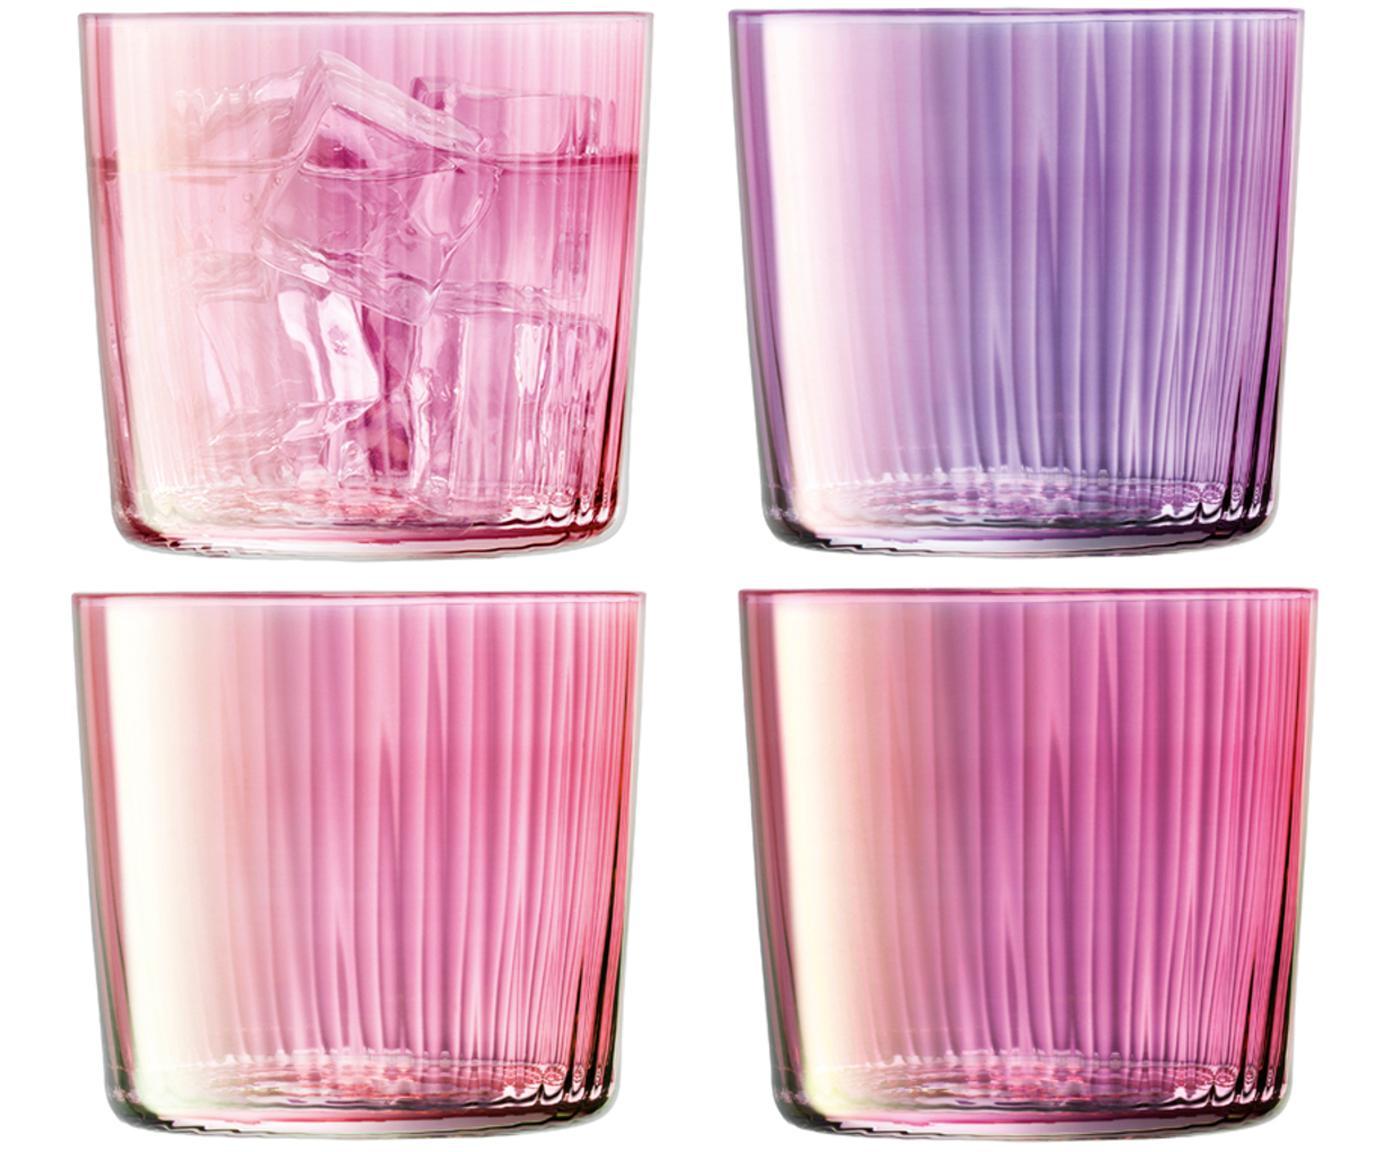 Set 4 bicchieri acqua in vetro soffiato Gems, Vetro, gonfiabile, Tonalità di rosa e viola, Ø 8 x Alt. 7 cm